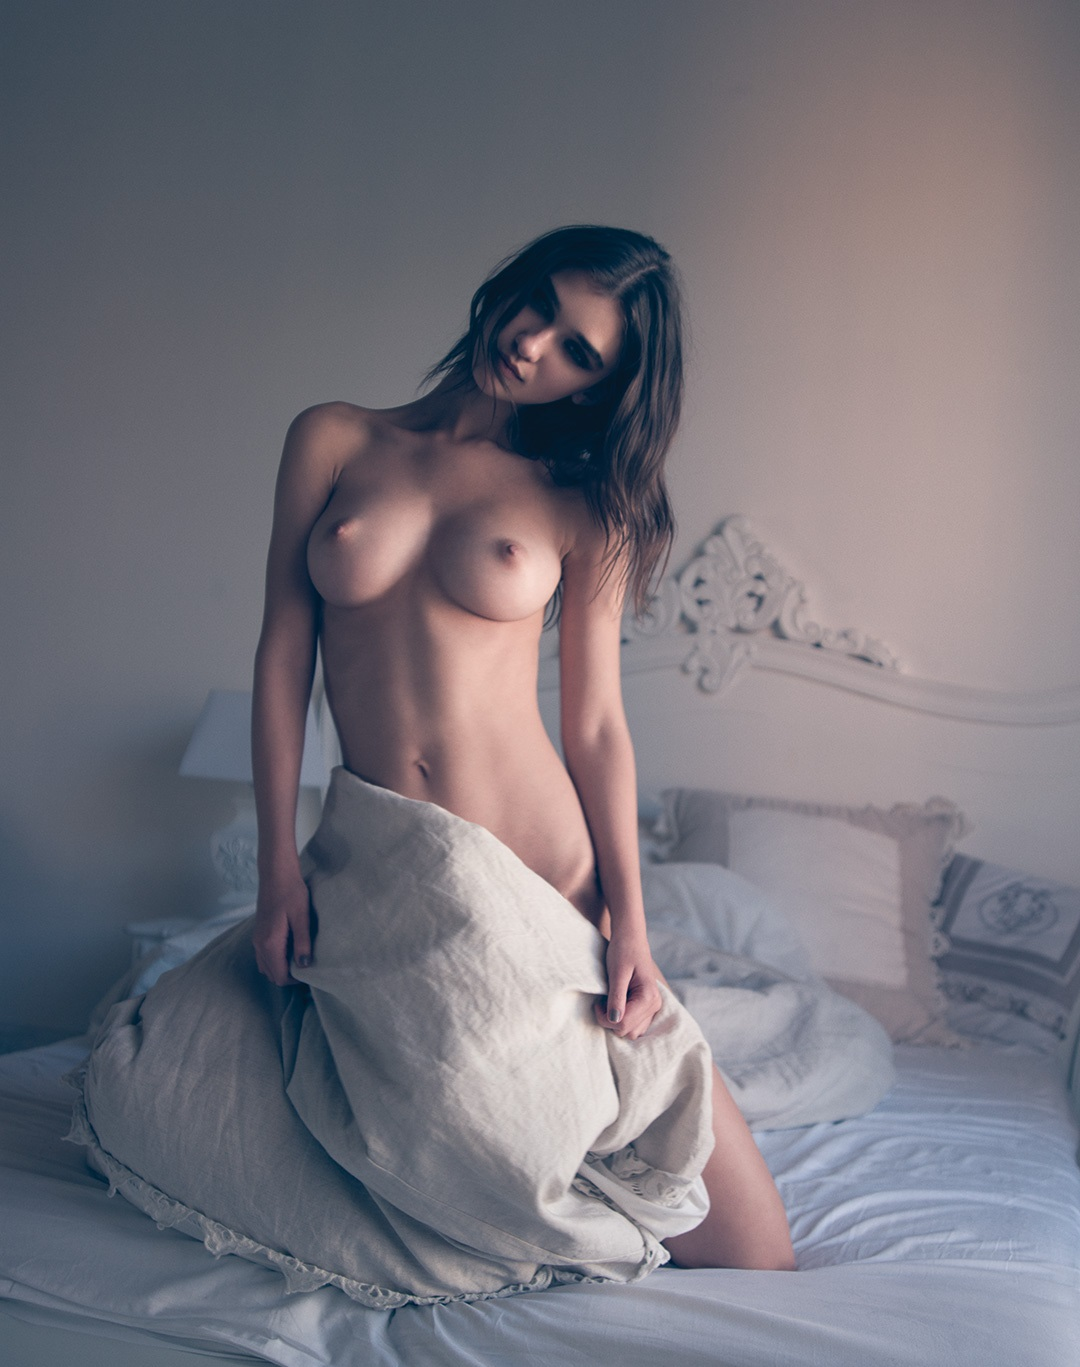 Paula Bulczynska - Dennison Bertram photoshoot